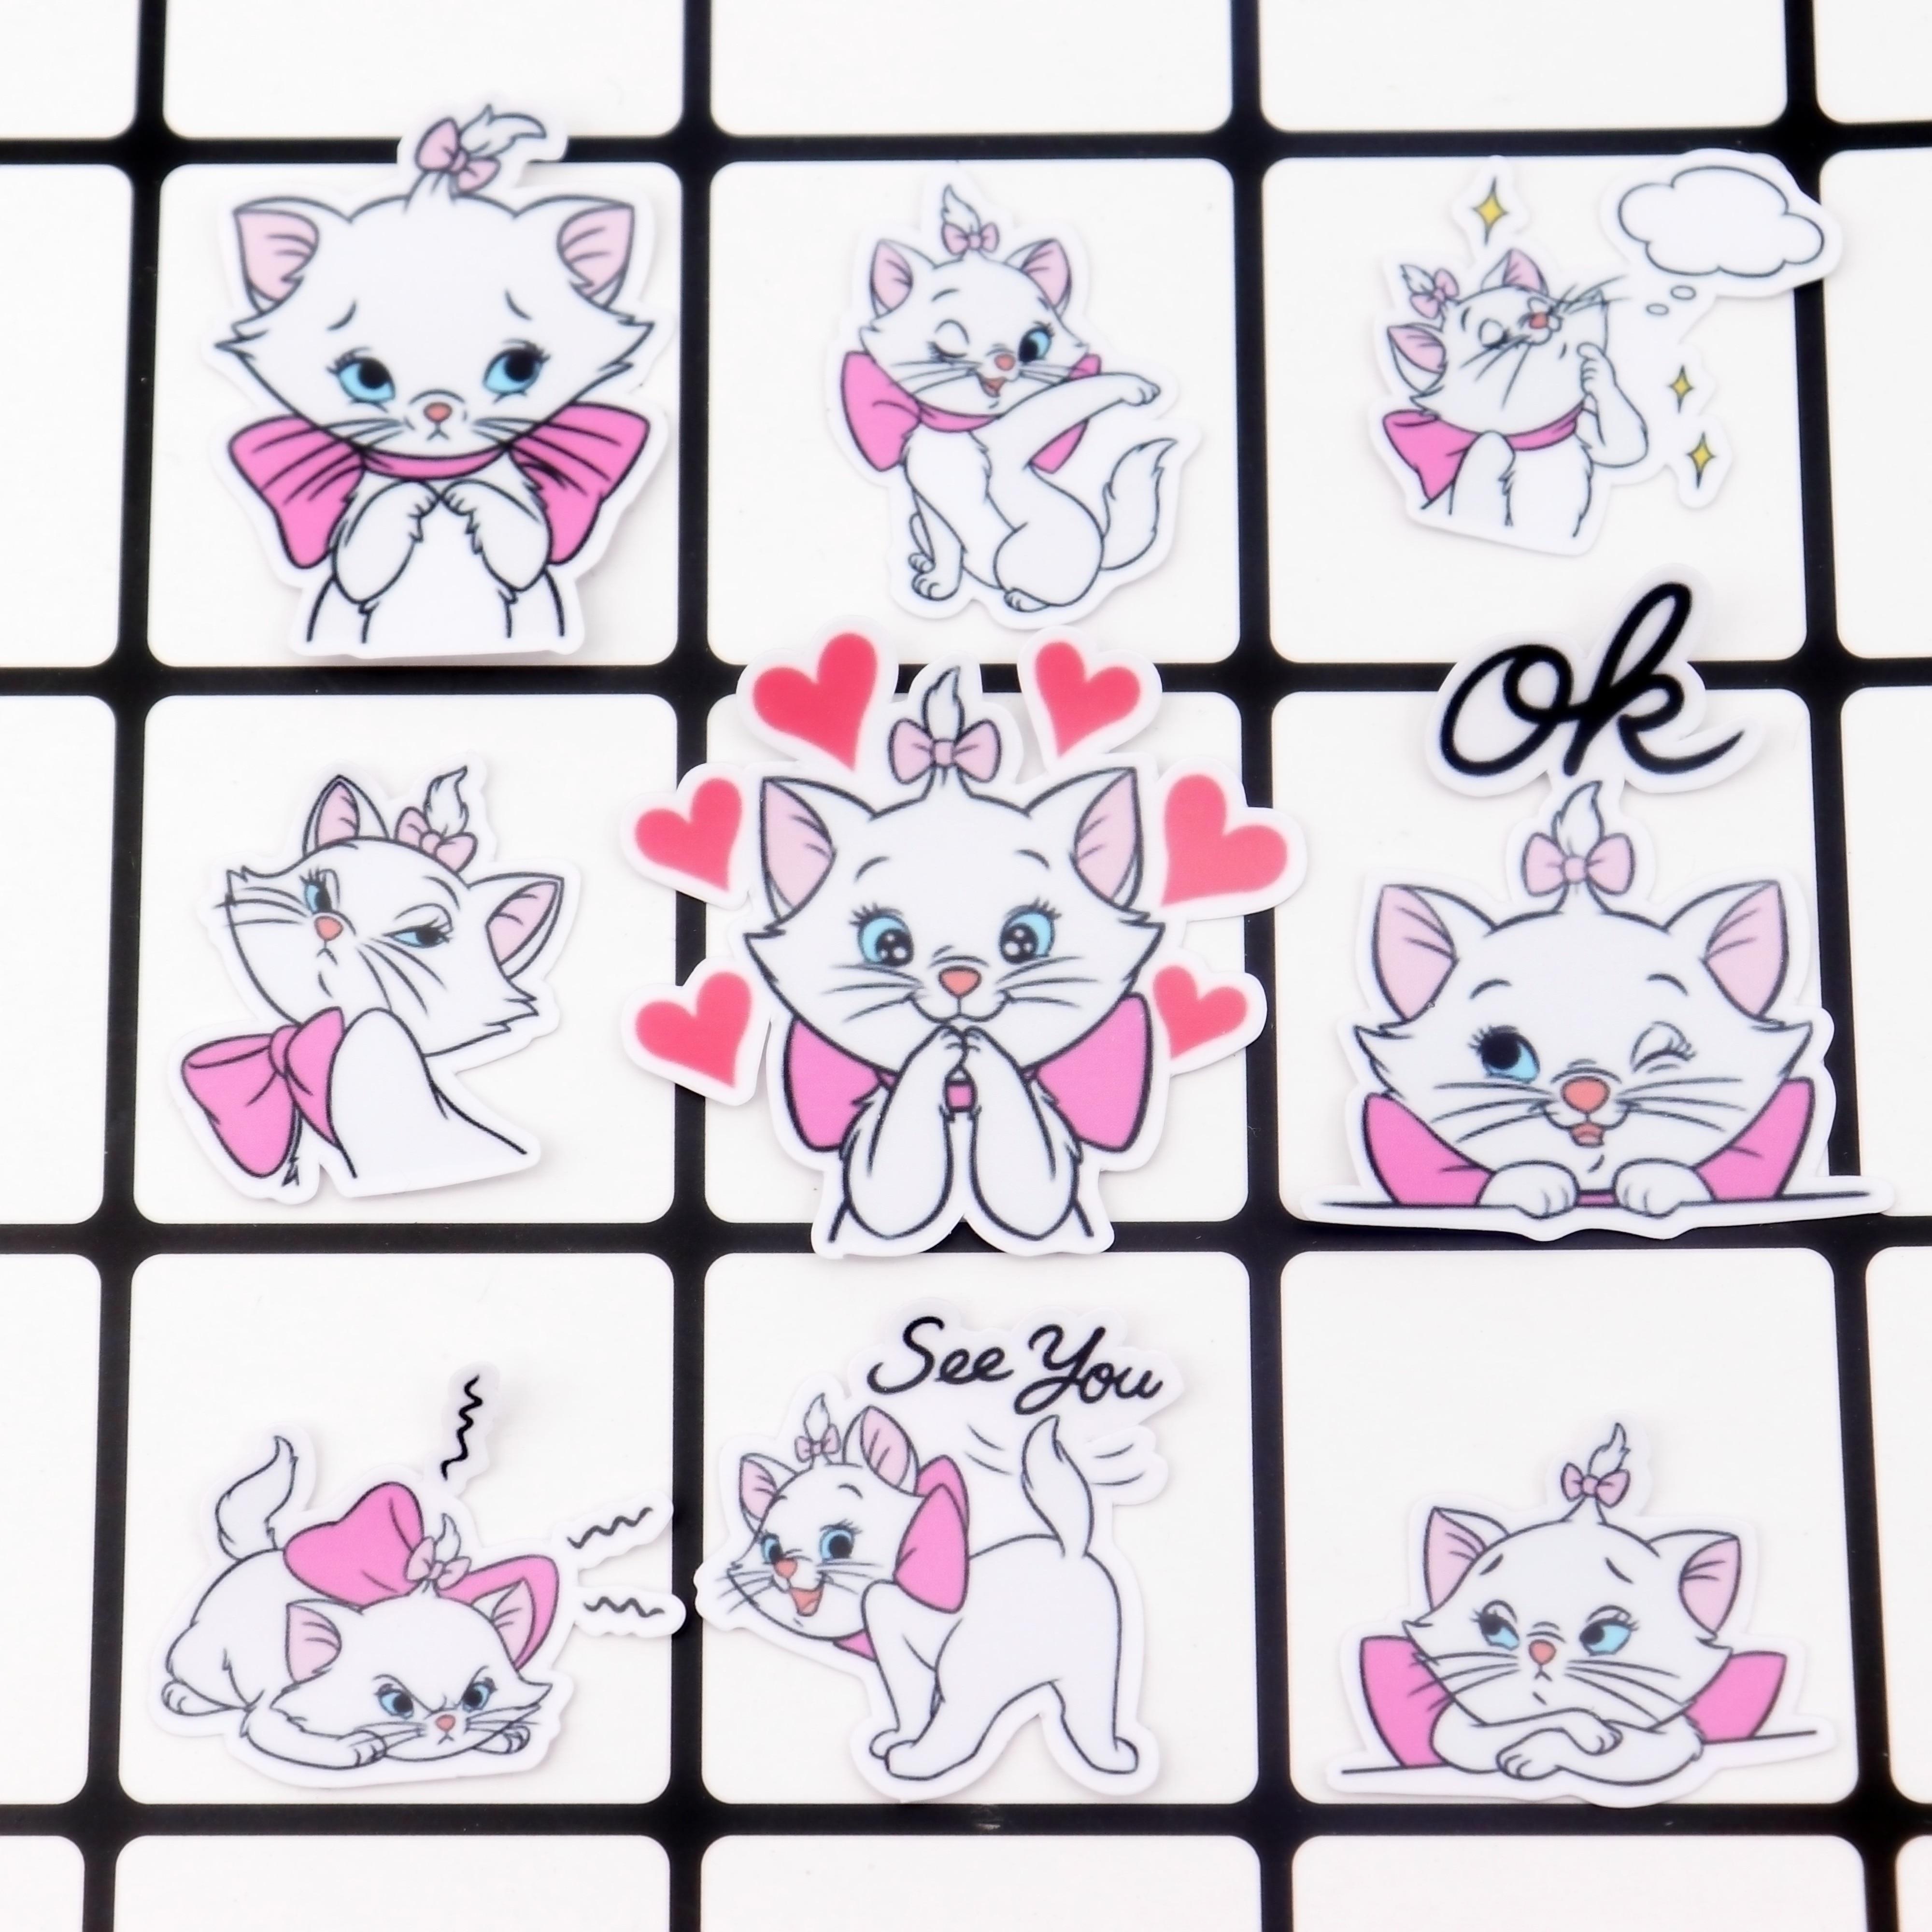 40pcs Creative Kawaii Self-made Mary Cat Stickers/scrapbooking Stickers /decorative /DIY Photo Albums Waterproof/Notebook Diary